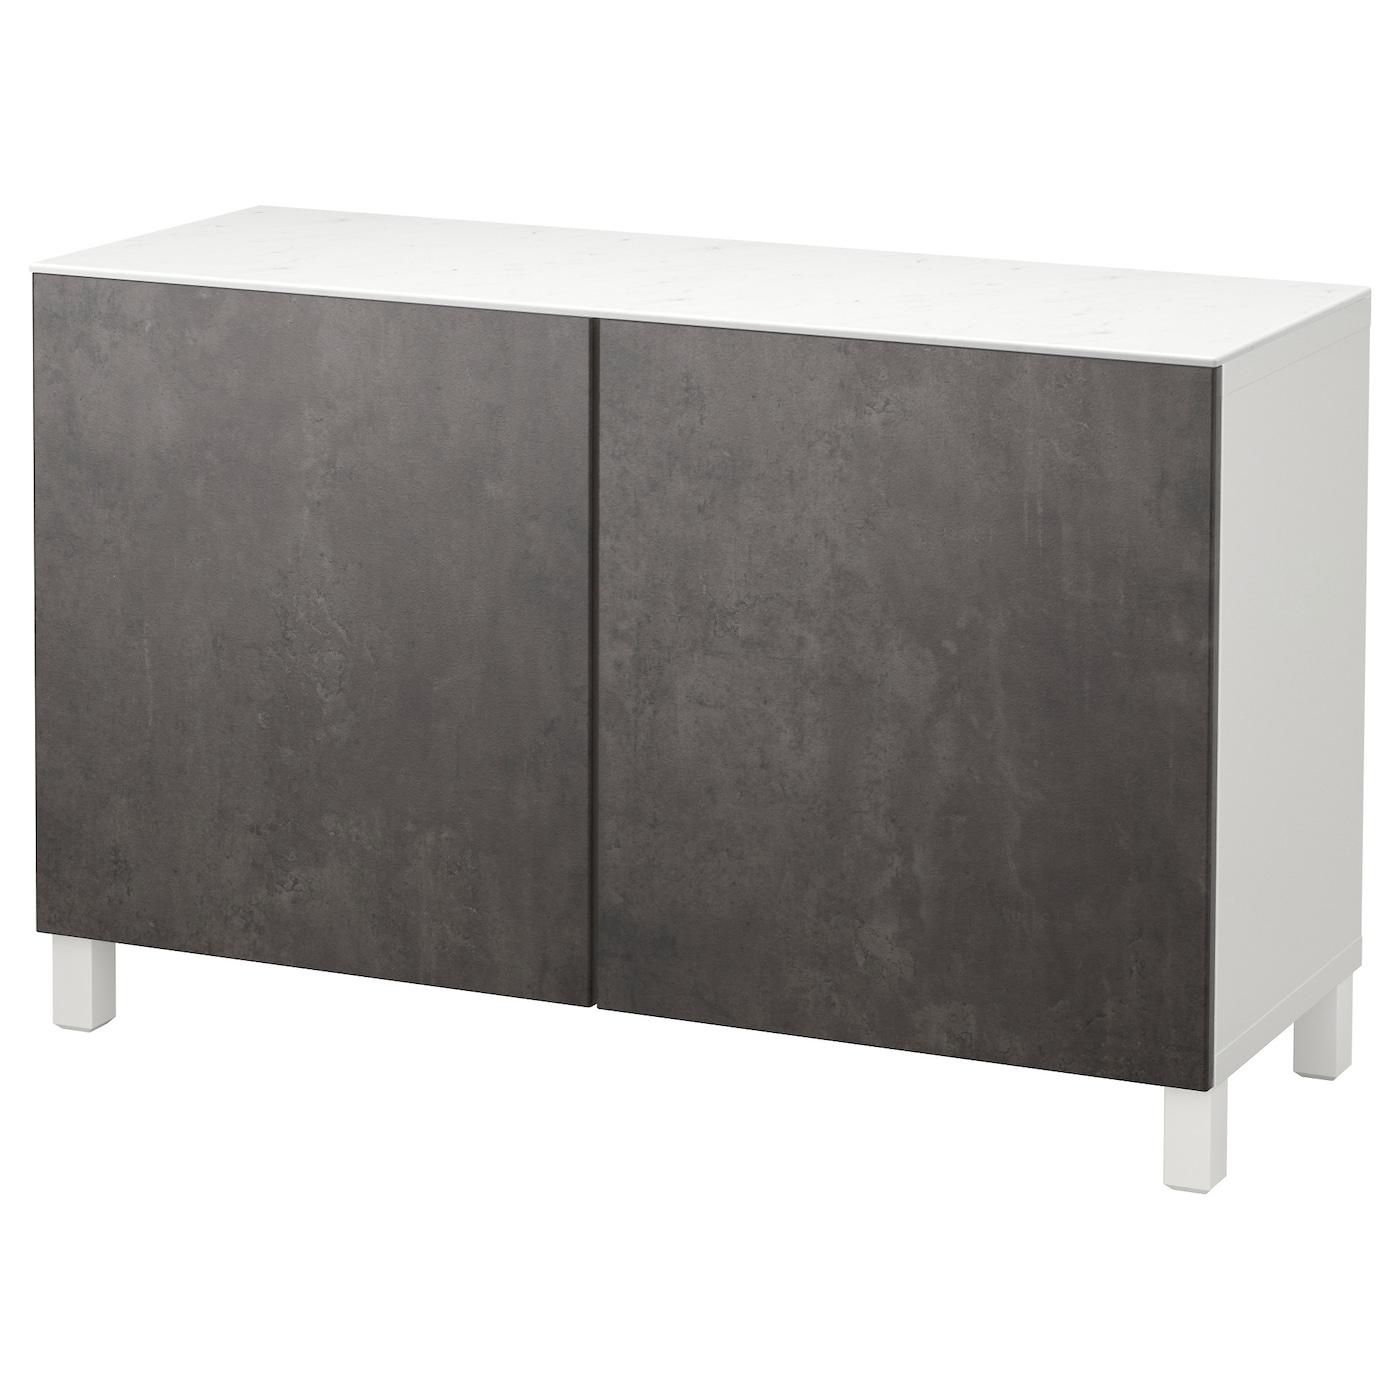 shelving units shelving systems ikea. Black Bedroom Furniture Sets. Home Design Ideas